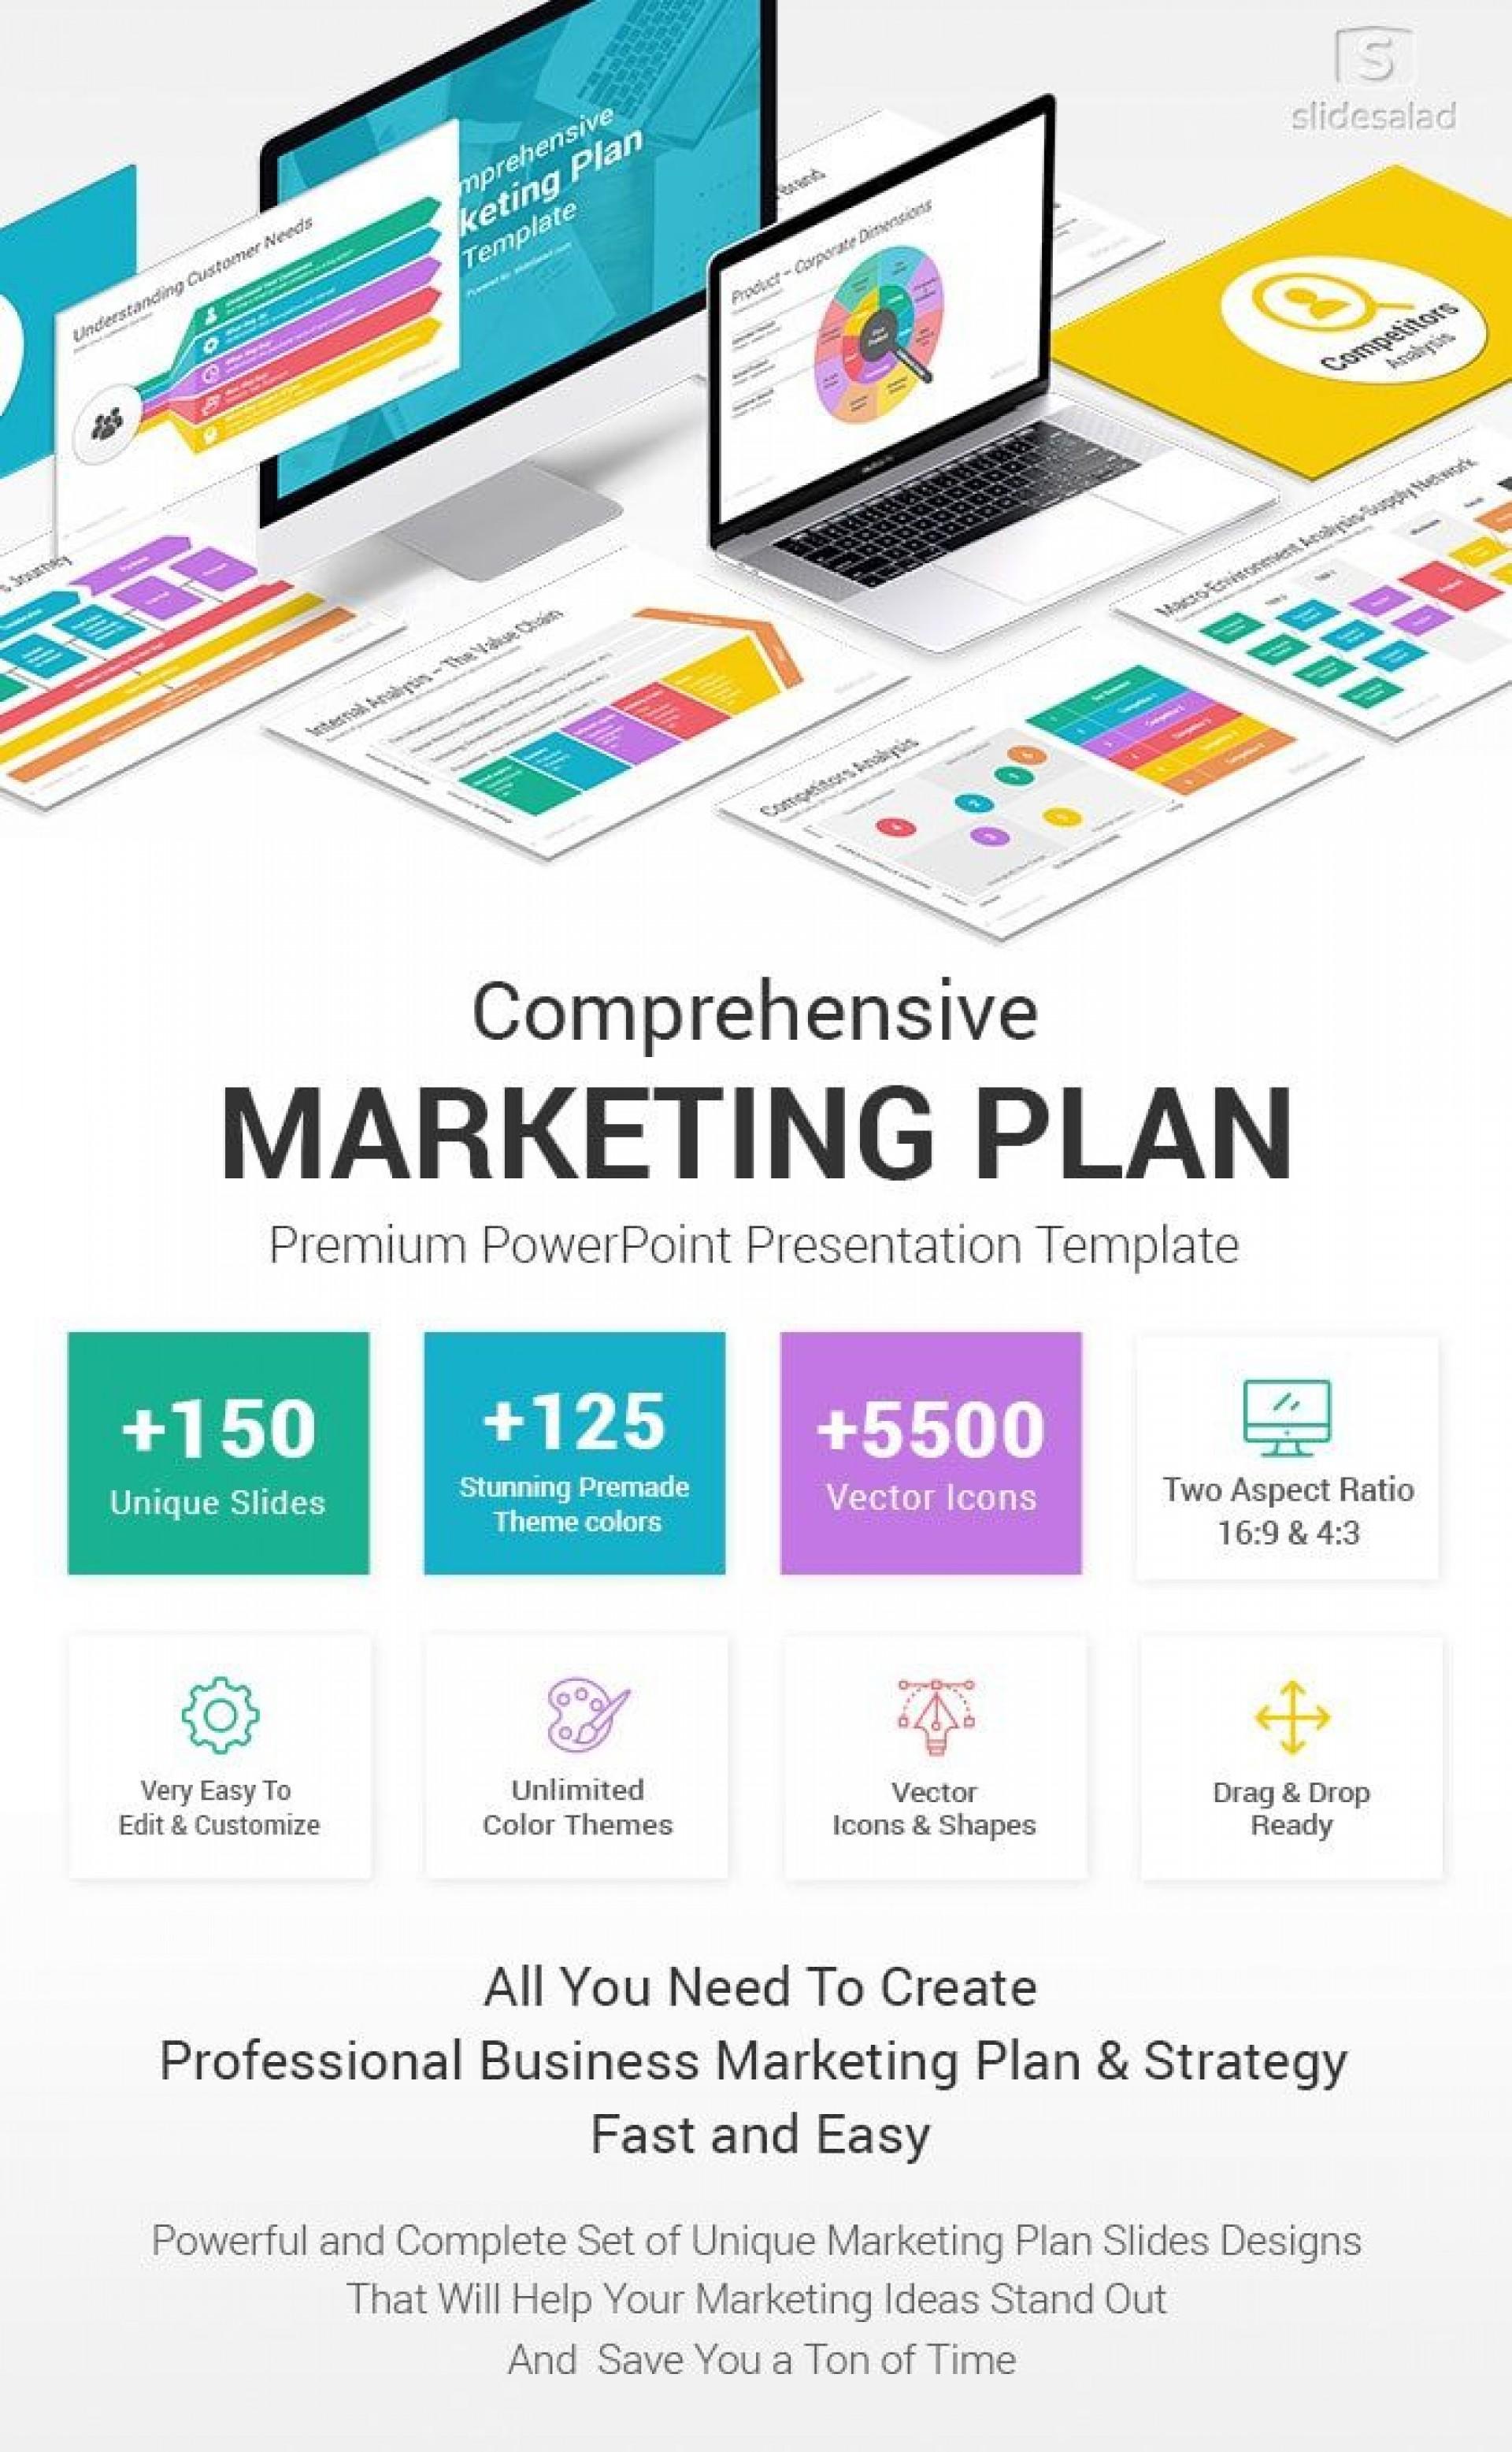 008 Outstanding Digital Marketing Plan Ppt Presentation High Def 1920